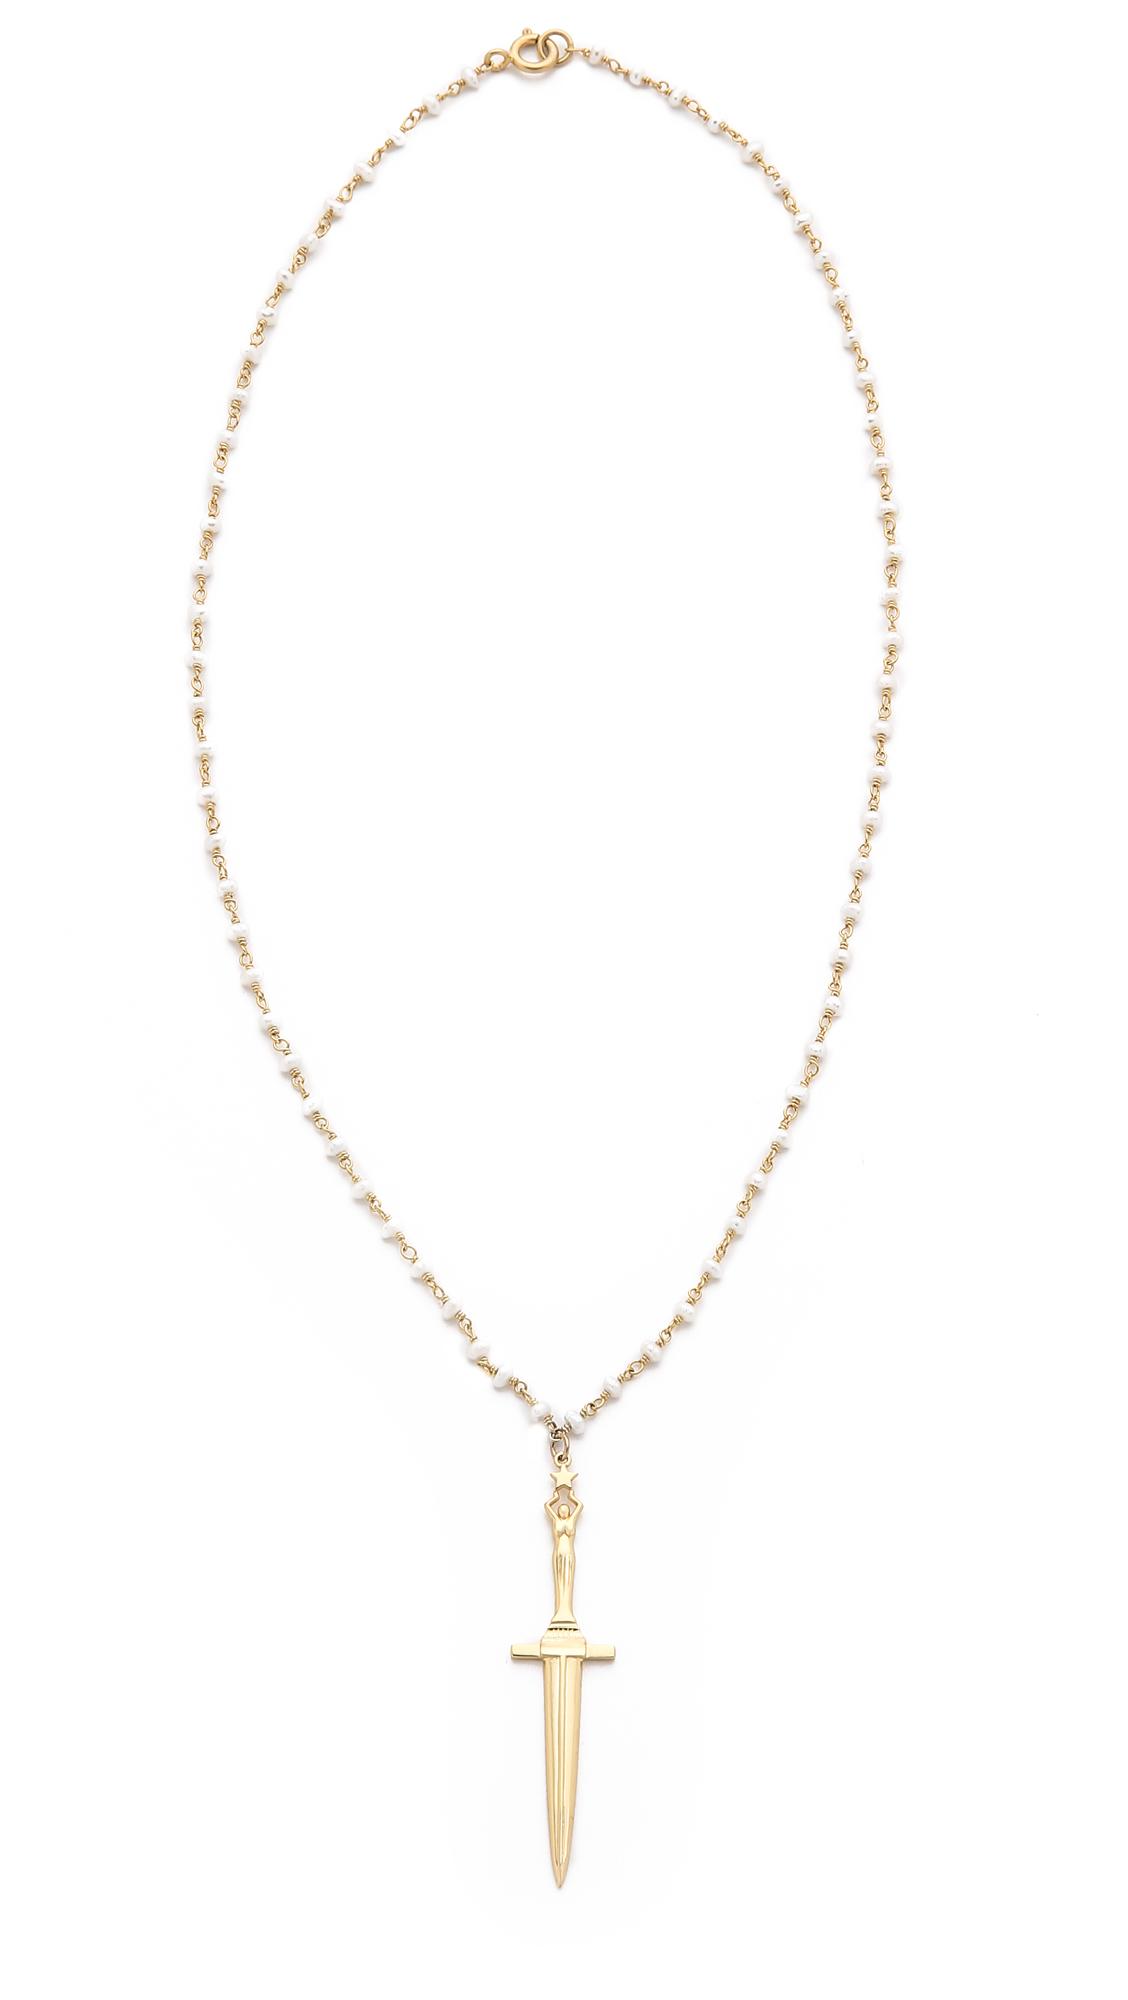 Top Lyst - Pamela Love Dagger Pendant Necklace in Metallic KL61